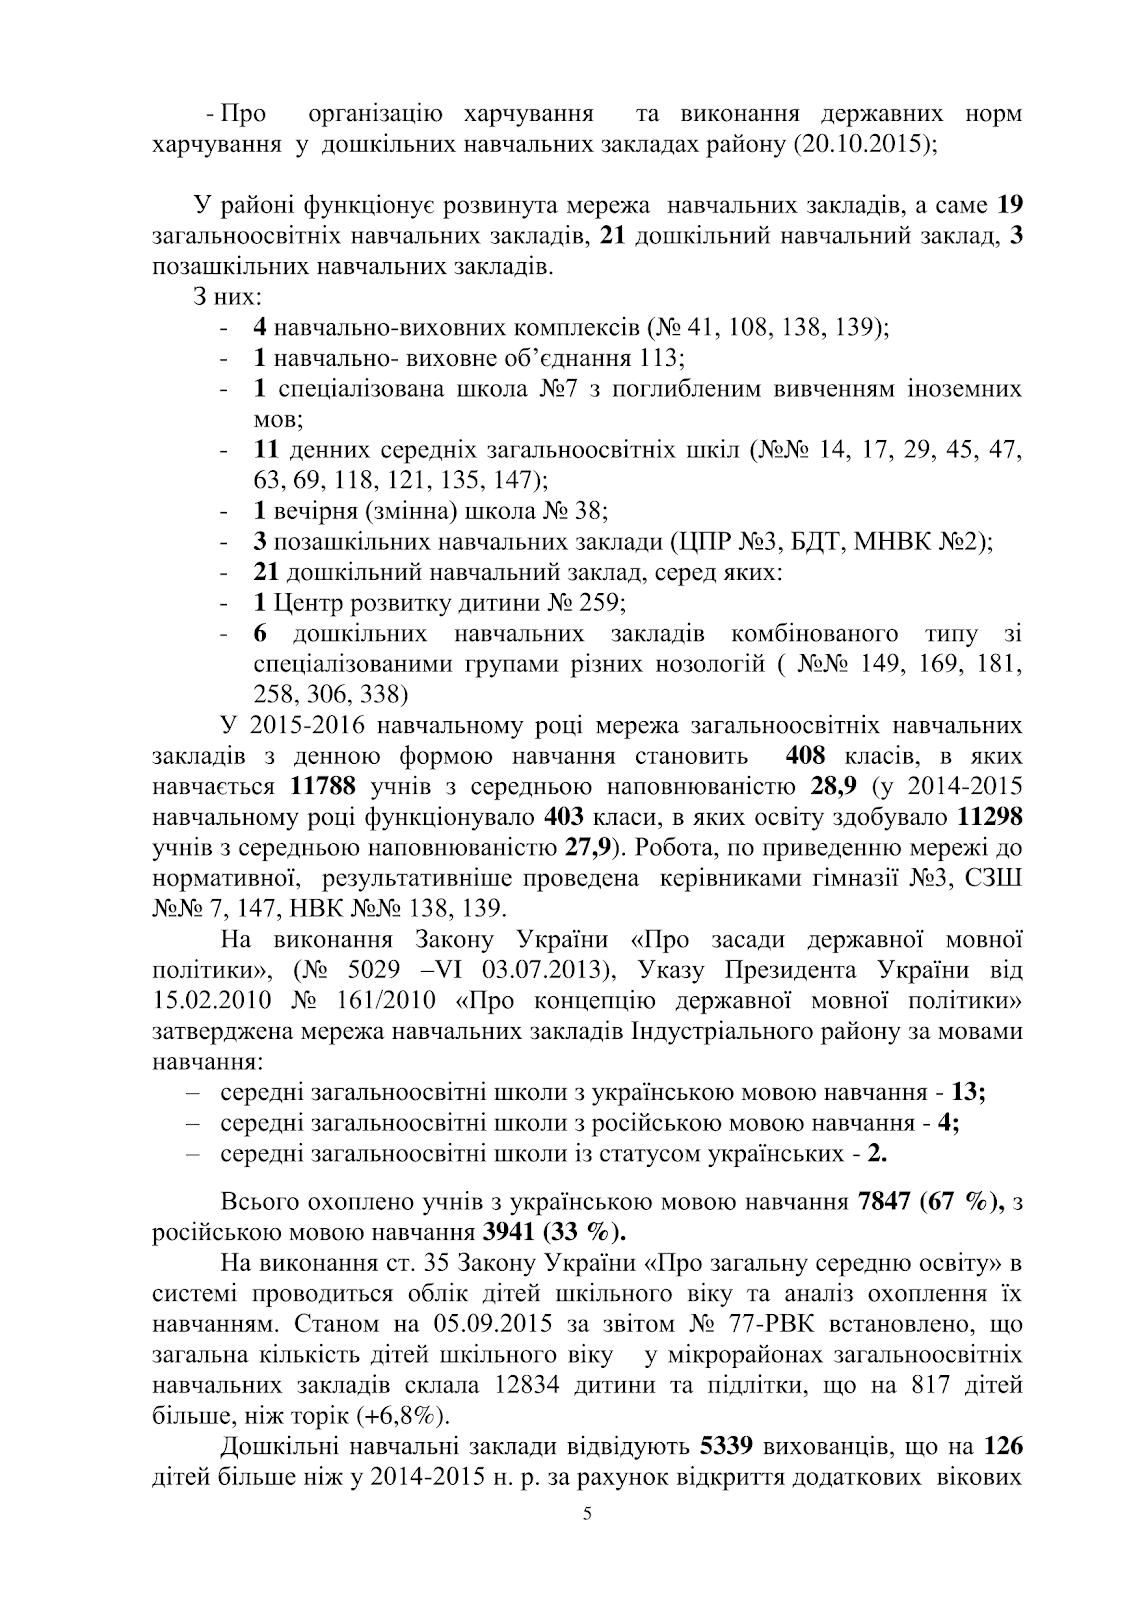 C:\Users\Валерия\Desktop\план 2016 рік\план 2016 рік-005.png